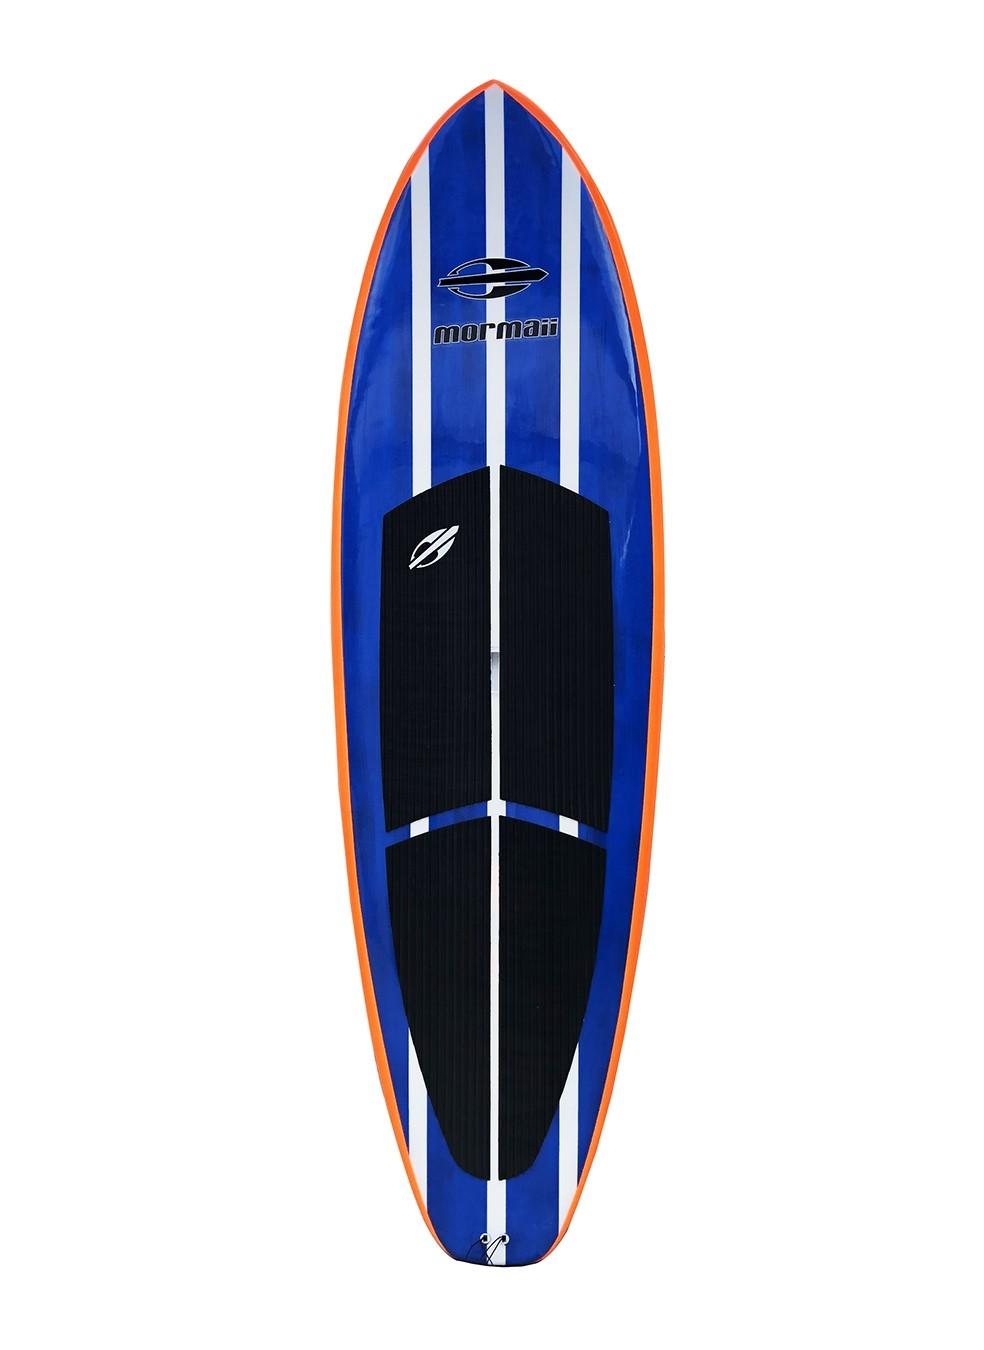 Prancha de Stand Up Paddle 10' Mormaii Azul Listrado - Pronta Entrega | Prancharia